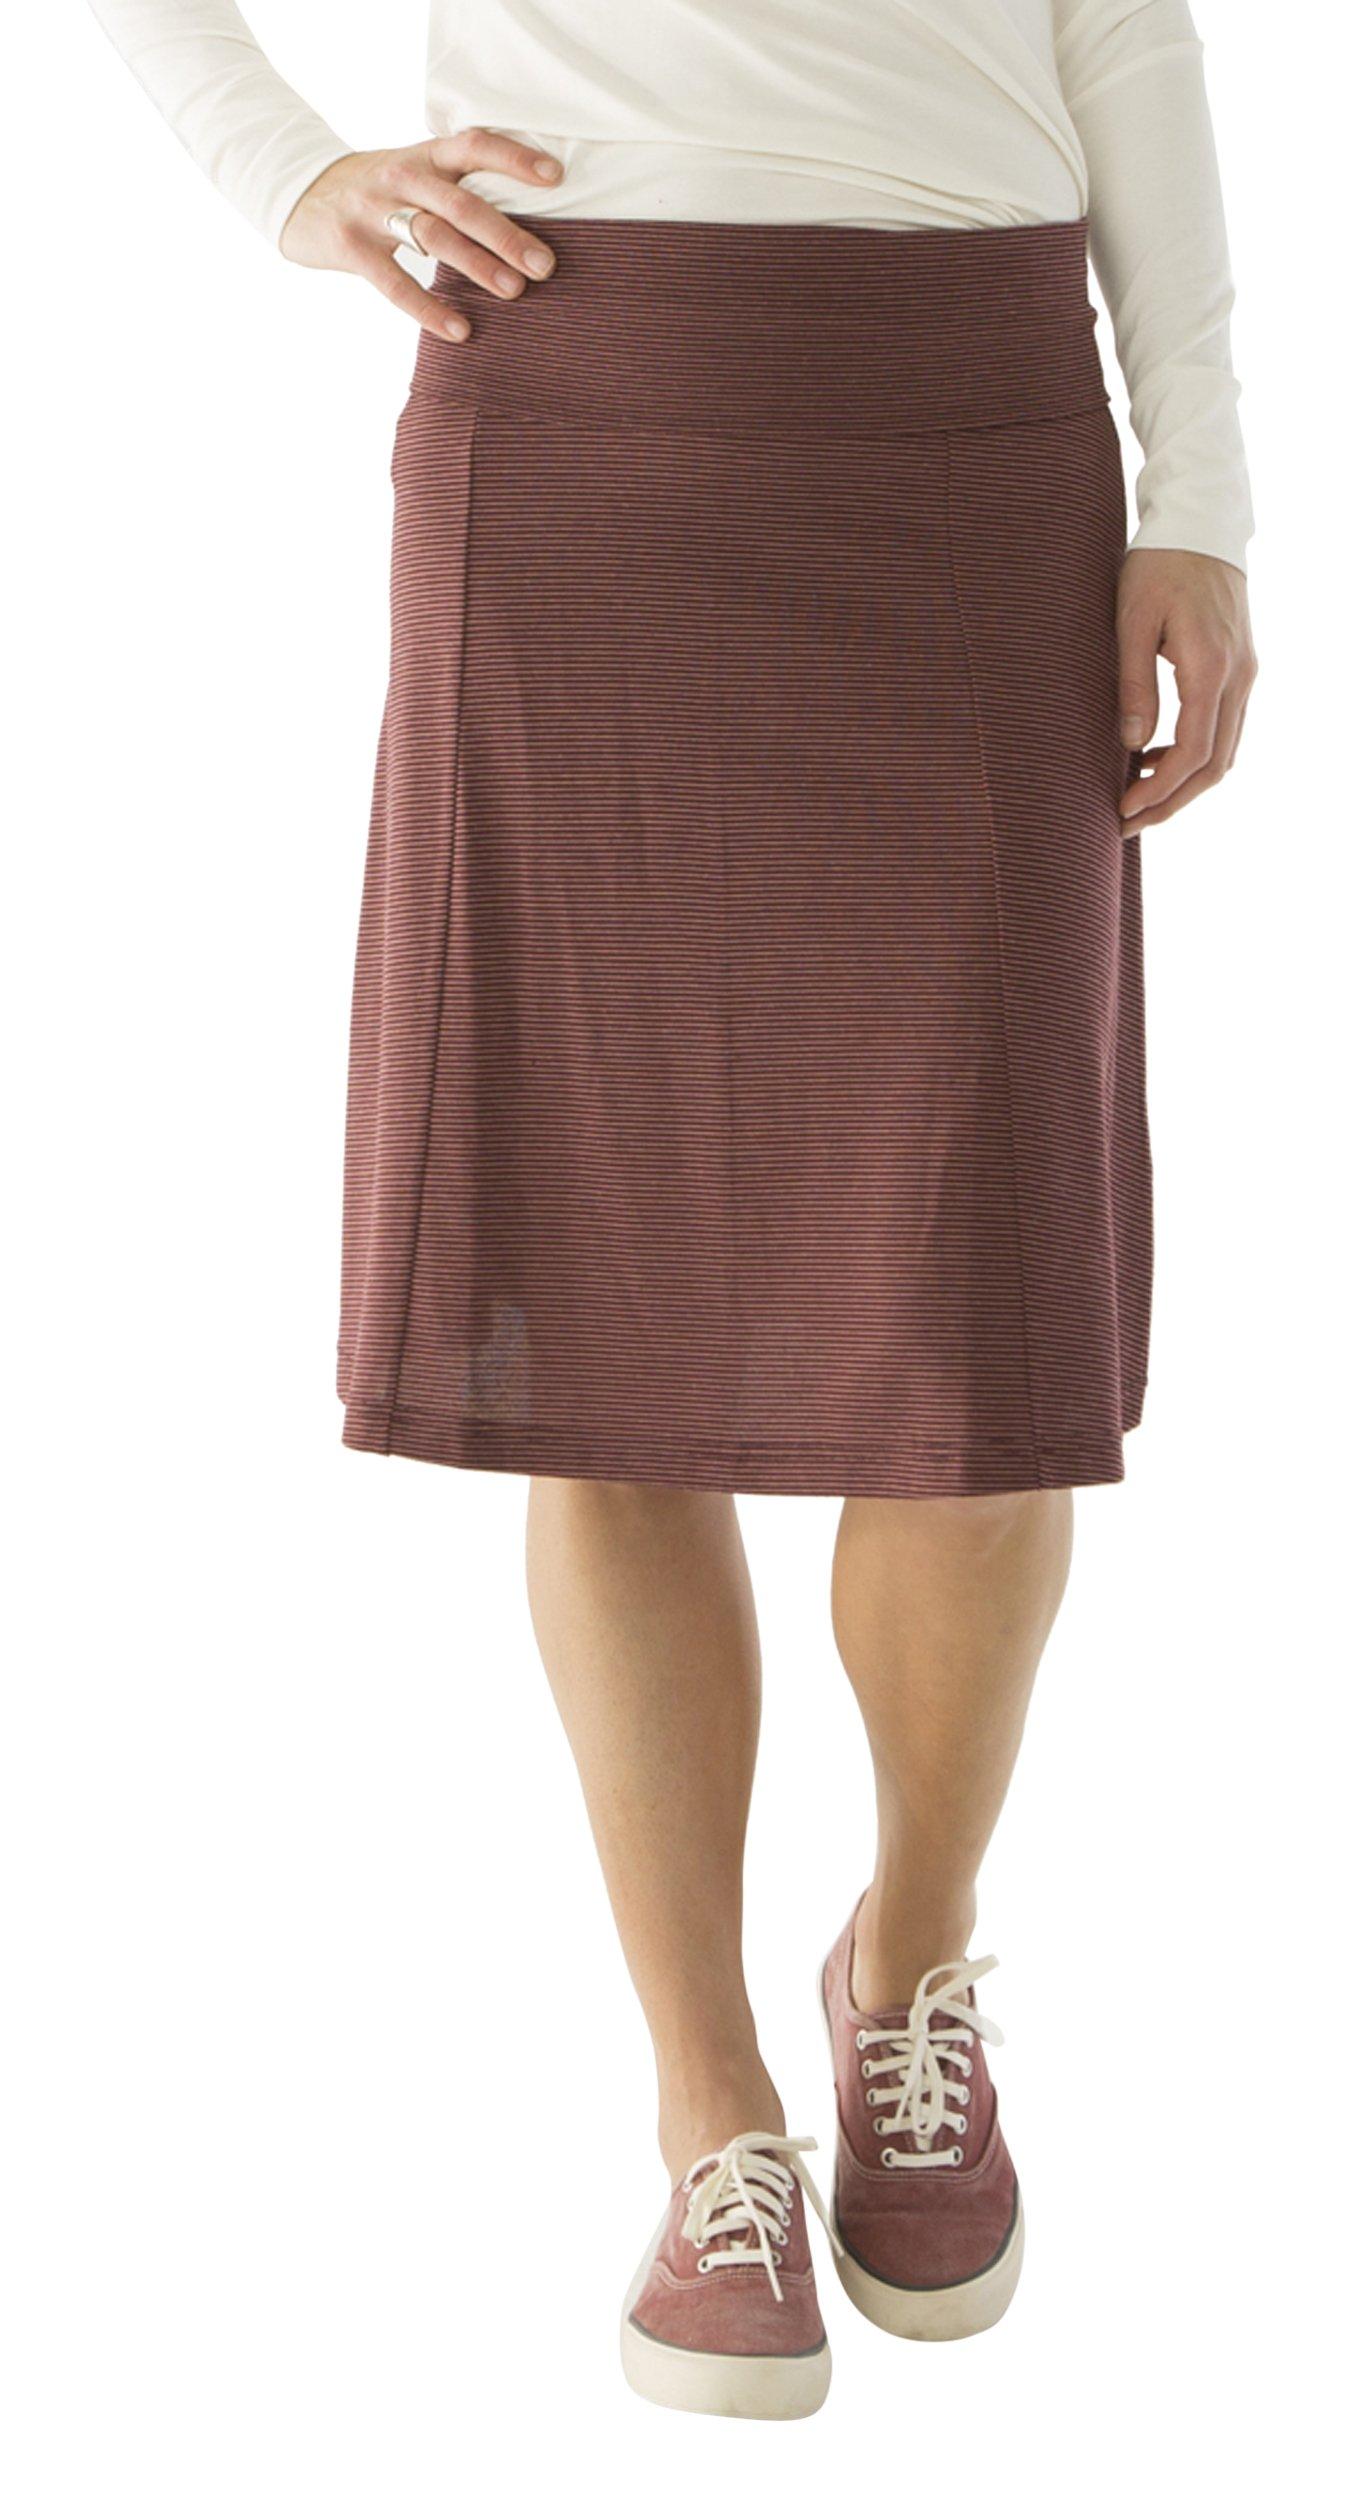 CARVE Designs Women's Saxon Skirt, Medium, Mulberry Southwest Stripe